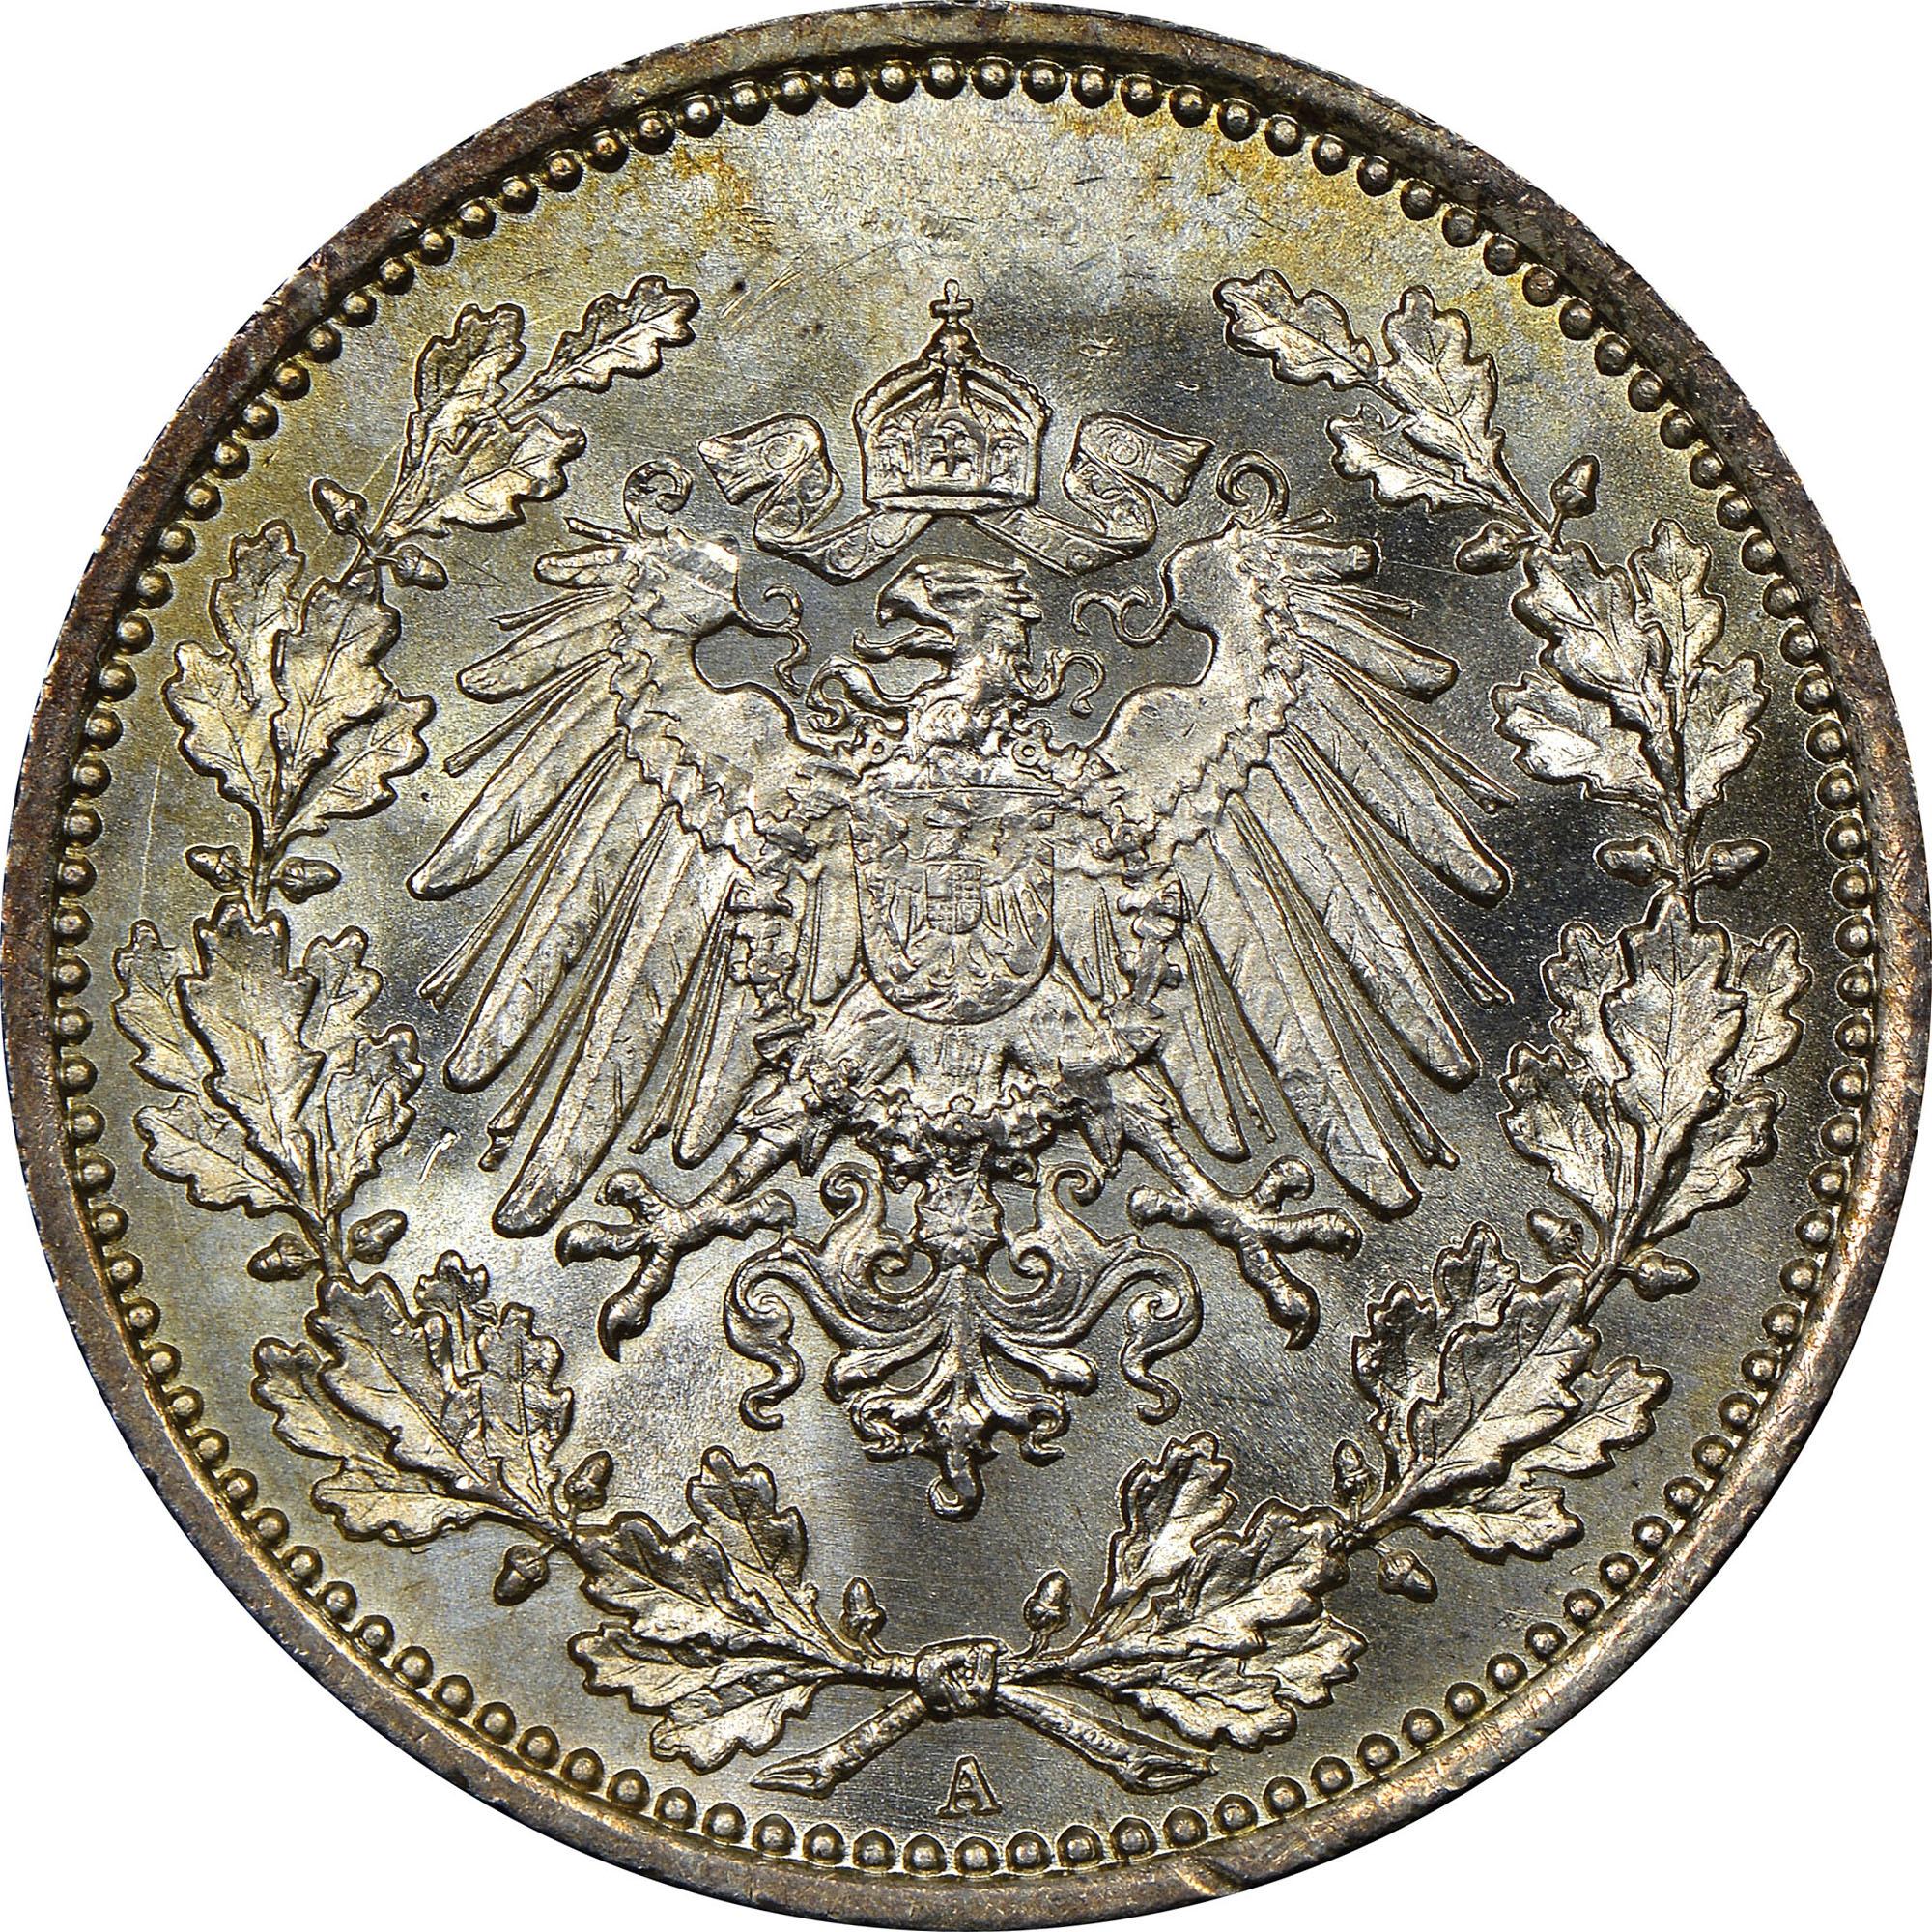 Germany - Empire 50 Pfennig reverse